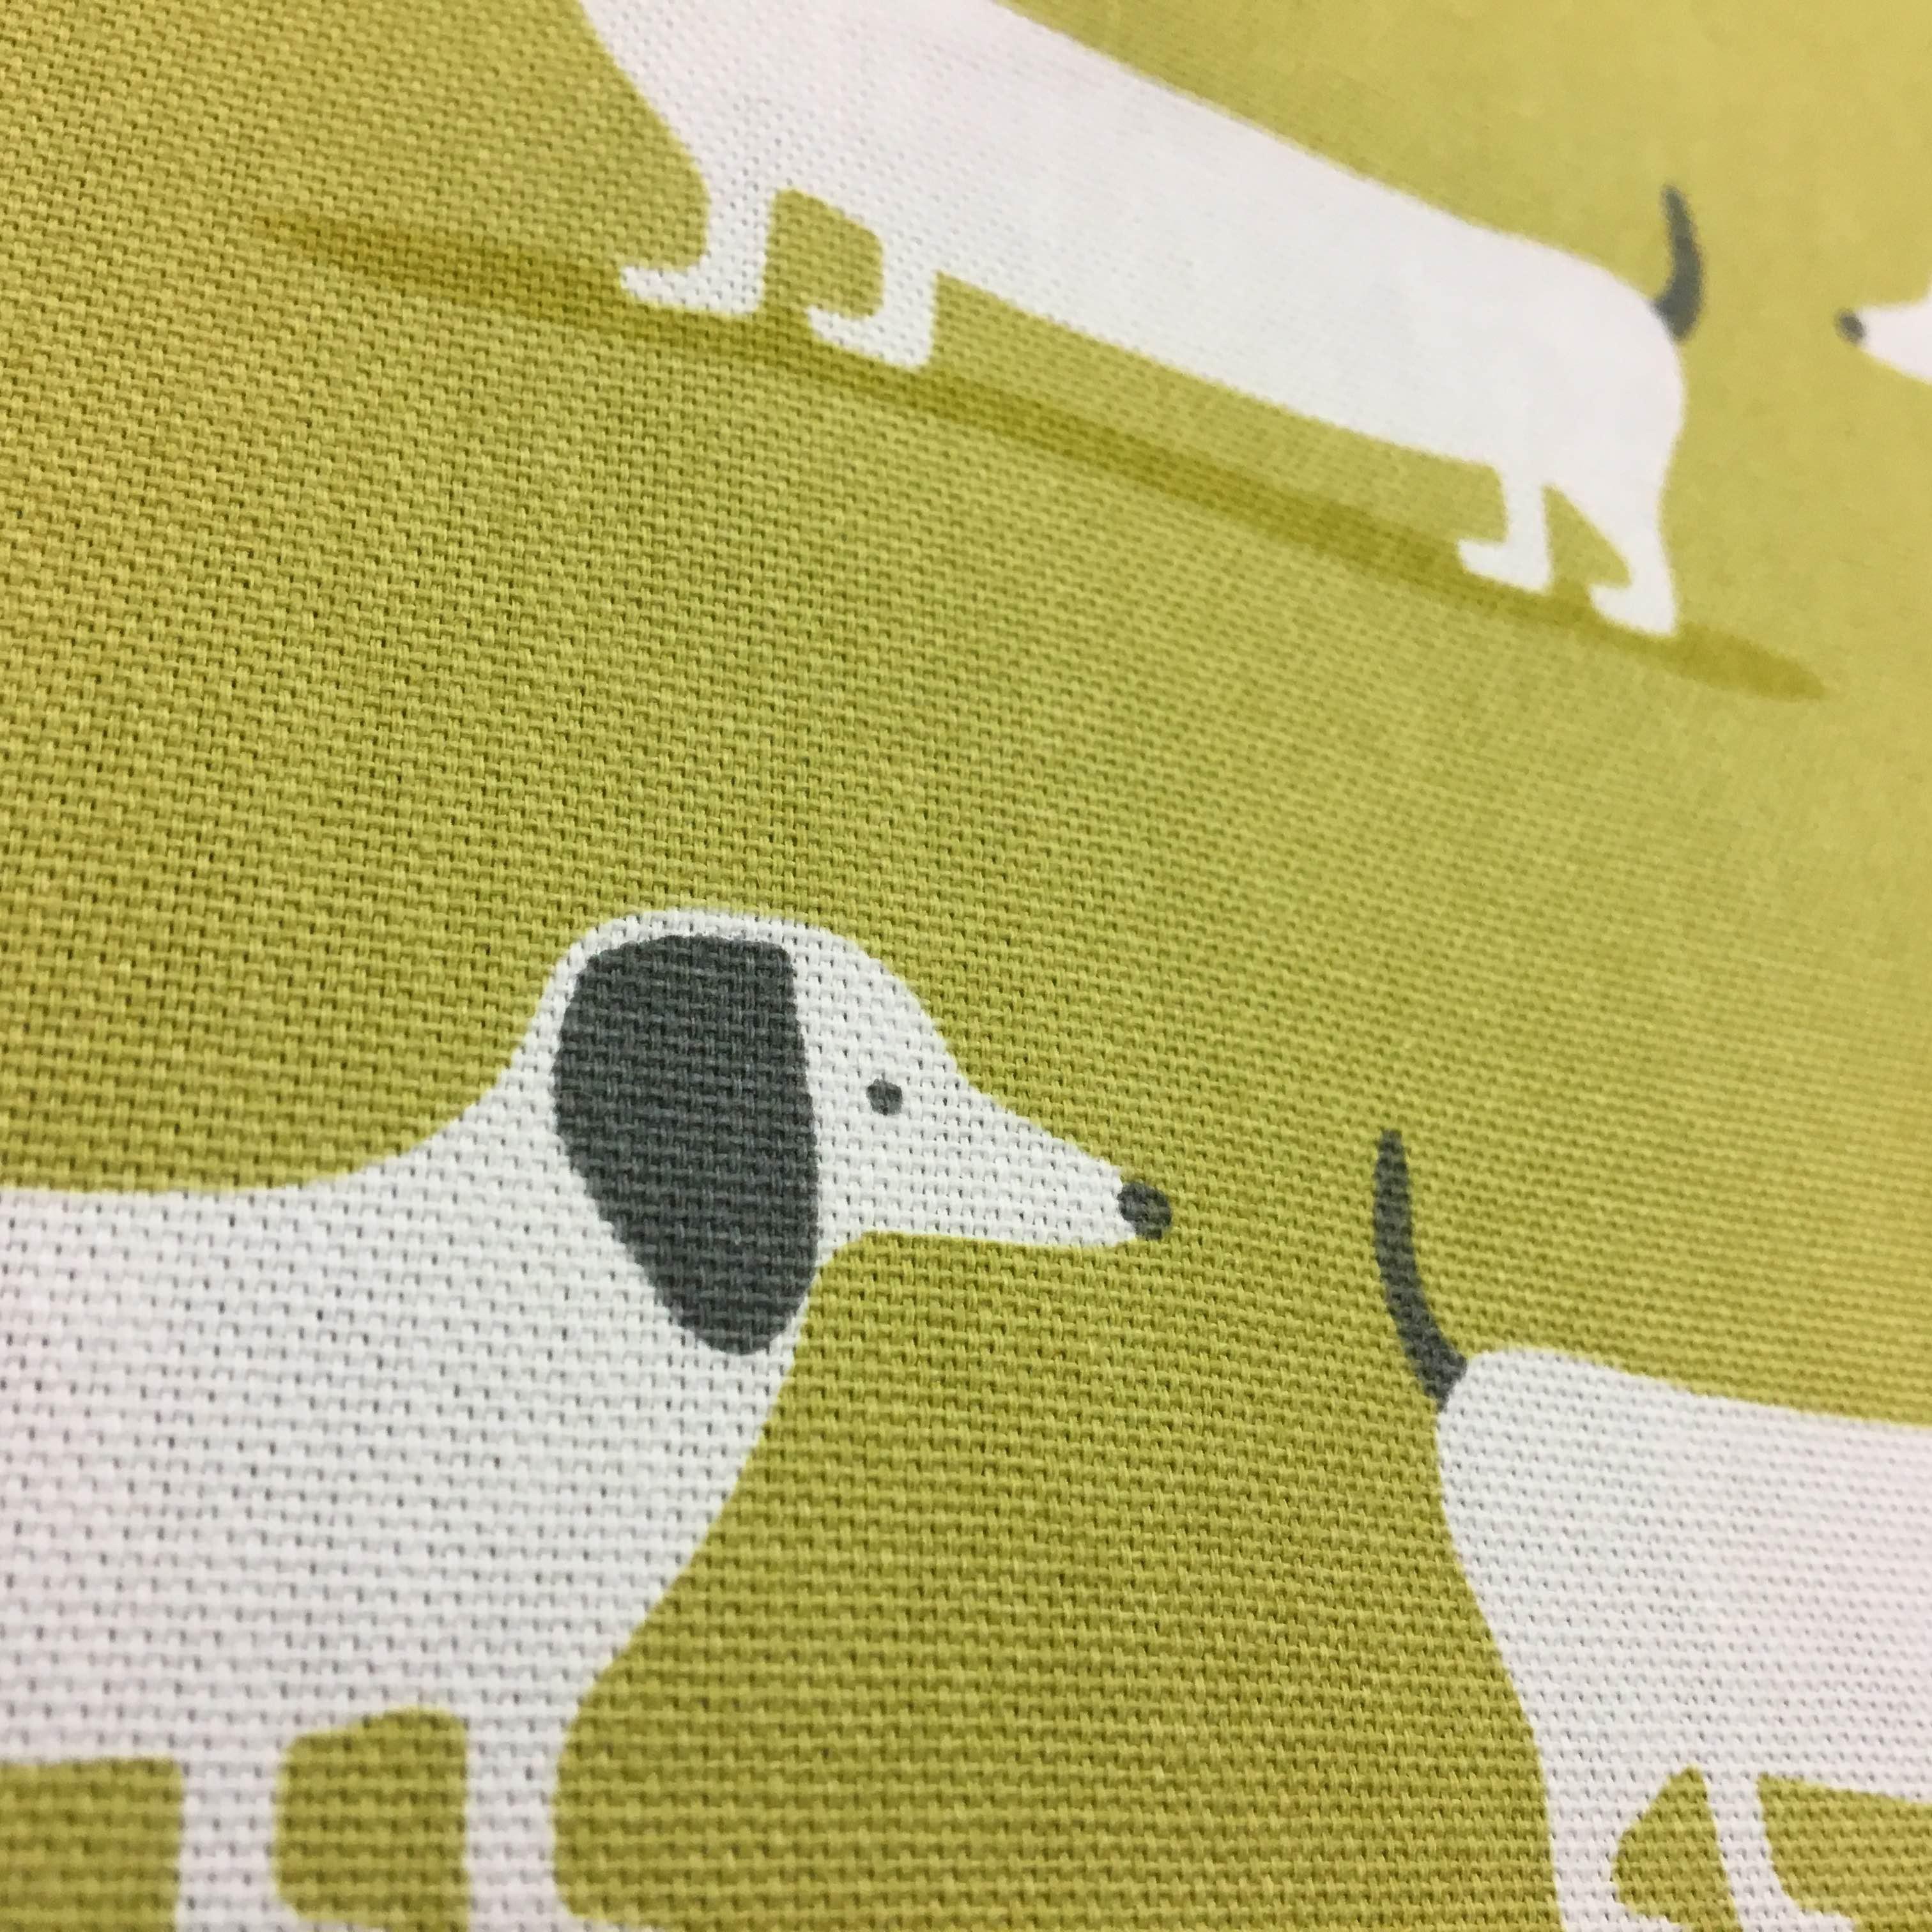 Fryetts Fabrics 100 Cotton Canvas Hound Dogs Ochre